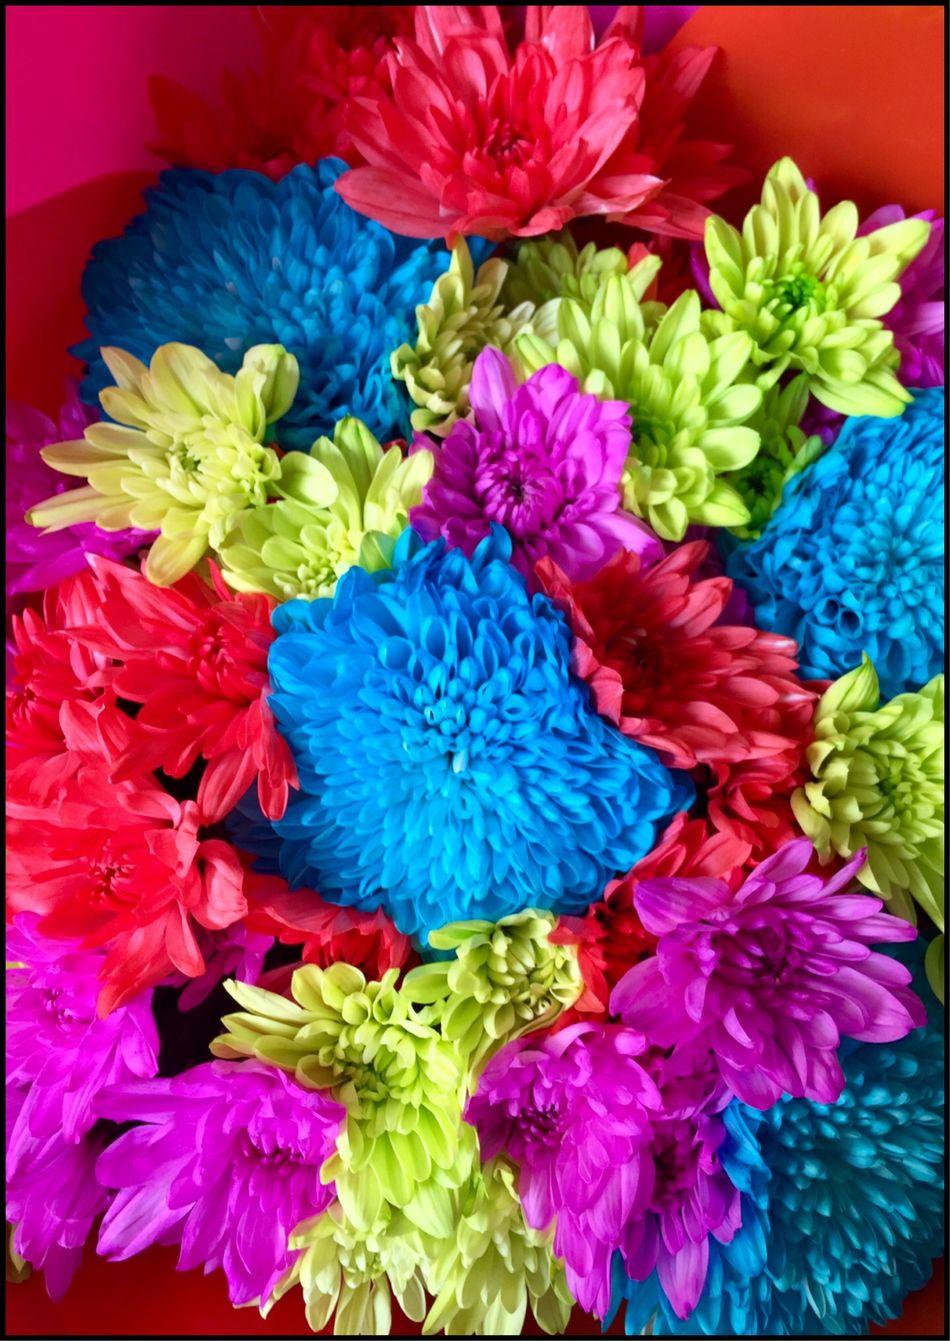 Beautiful bunch of Flower's 💐💐💐 Bouquet Bouquet Of Flowers Flowers Flower Collection Flowers Of EyeEm Rainbowflowers Flowerphotography Flowersoftheday Flowermagic Scent Of A Flower Beautiful Flowers 💐💐💐